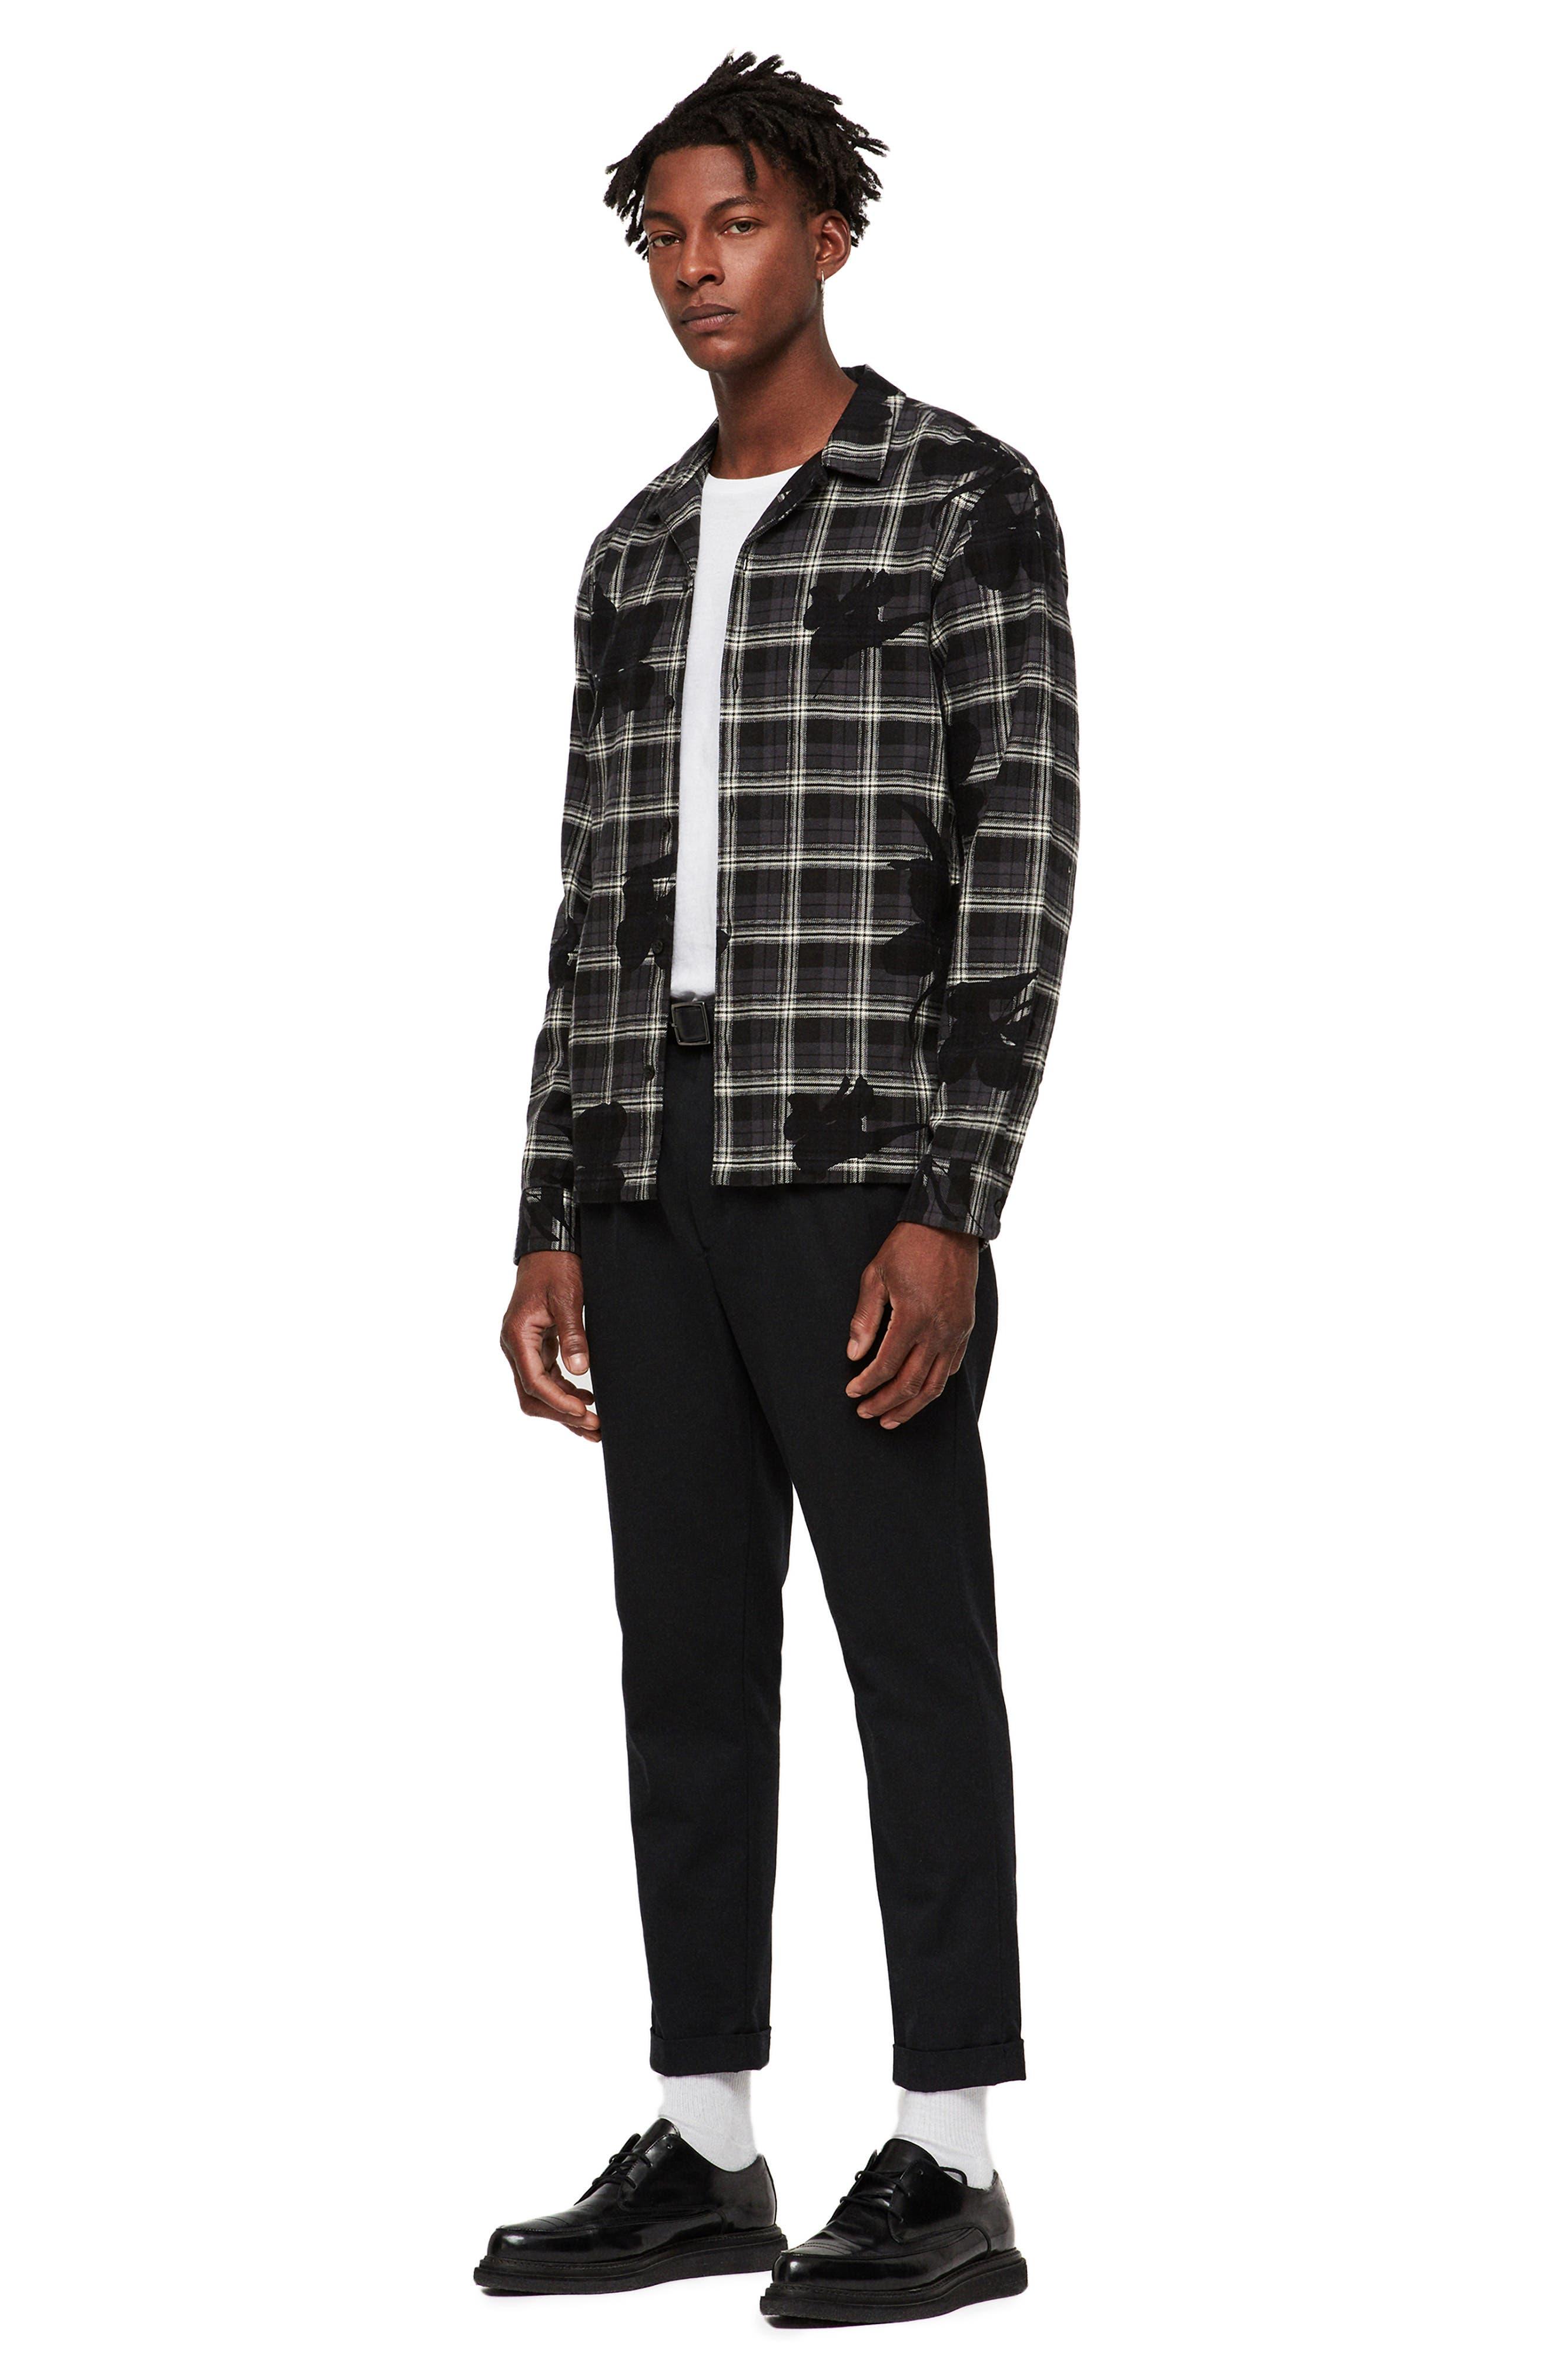 Lilyplaid Slim Fit Flannel Shirt,                             Alternate thumbnail 4, color,                             001